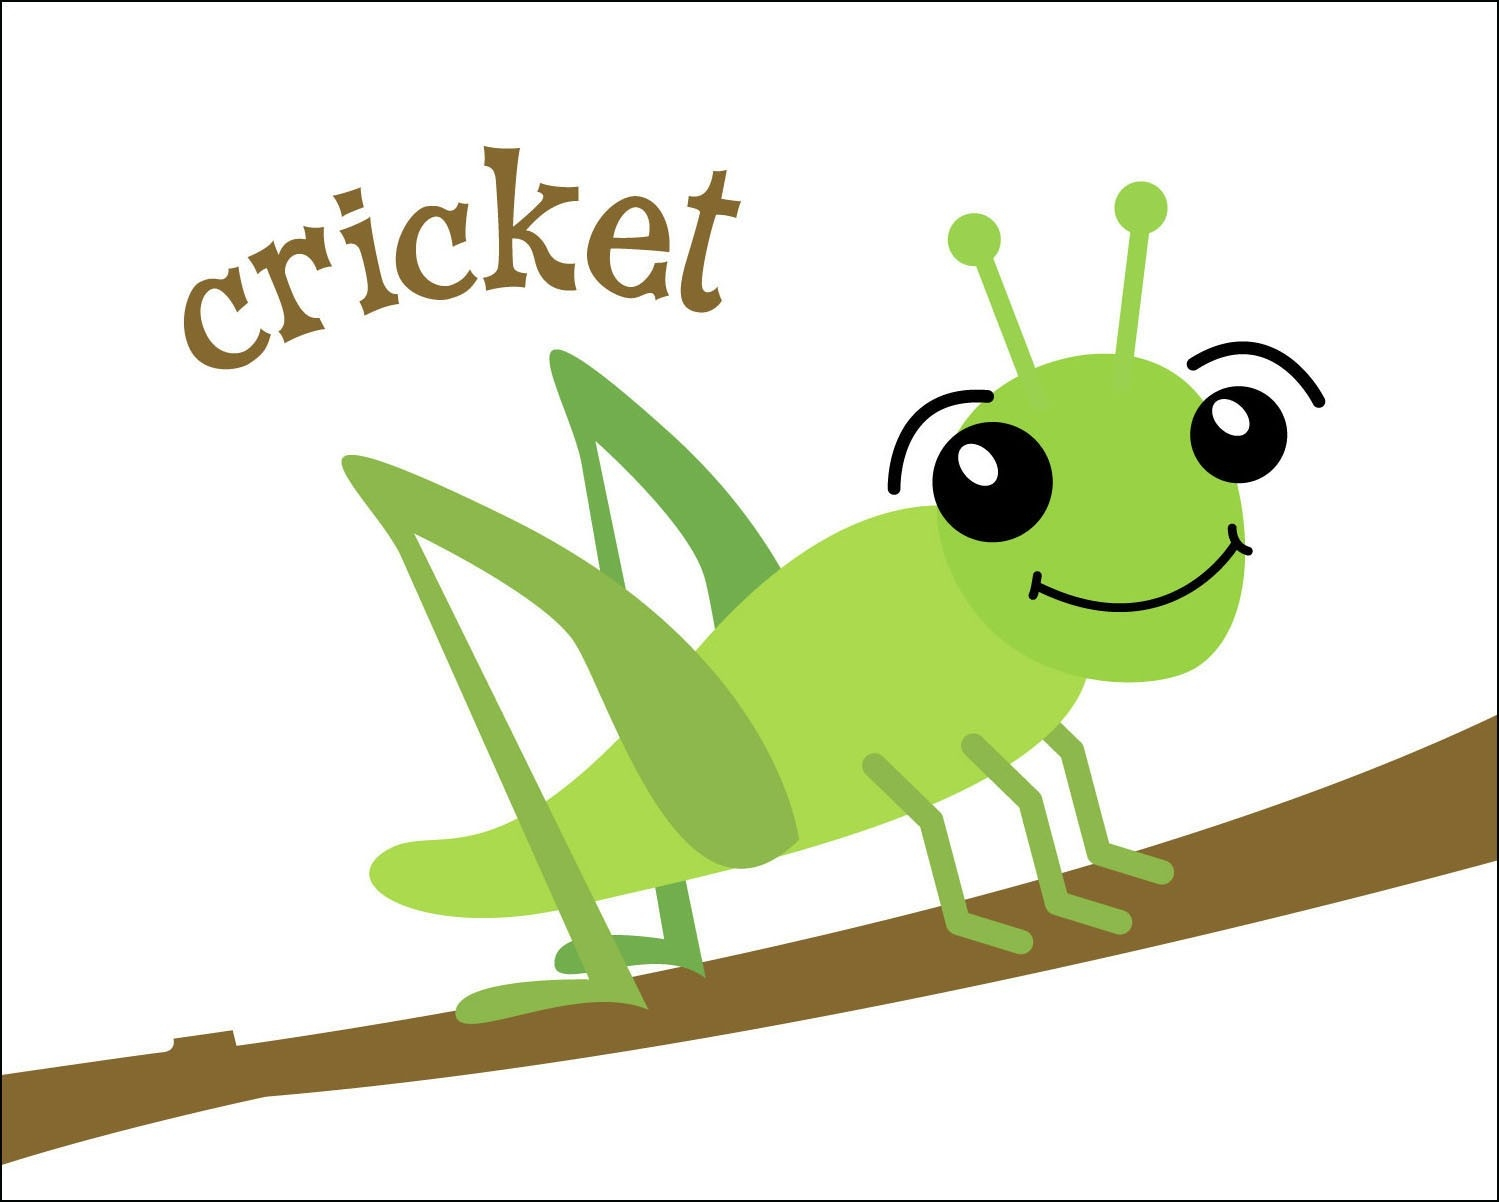 Insect cricket clipart clipartfox 3